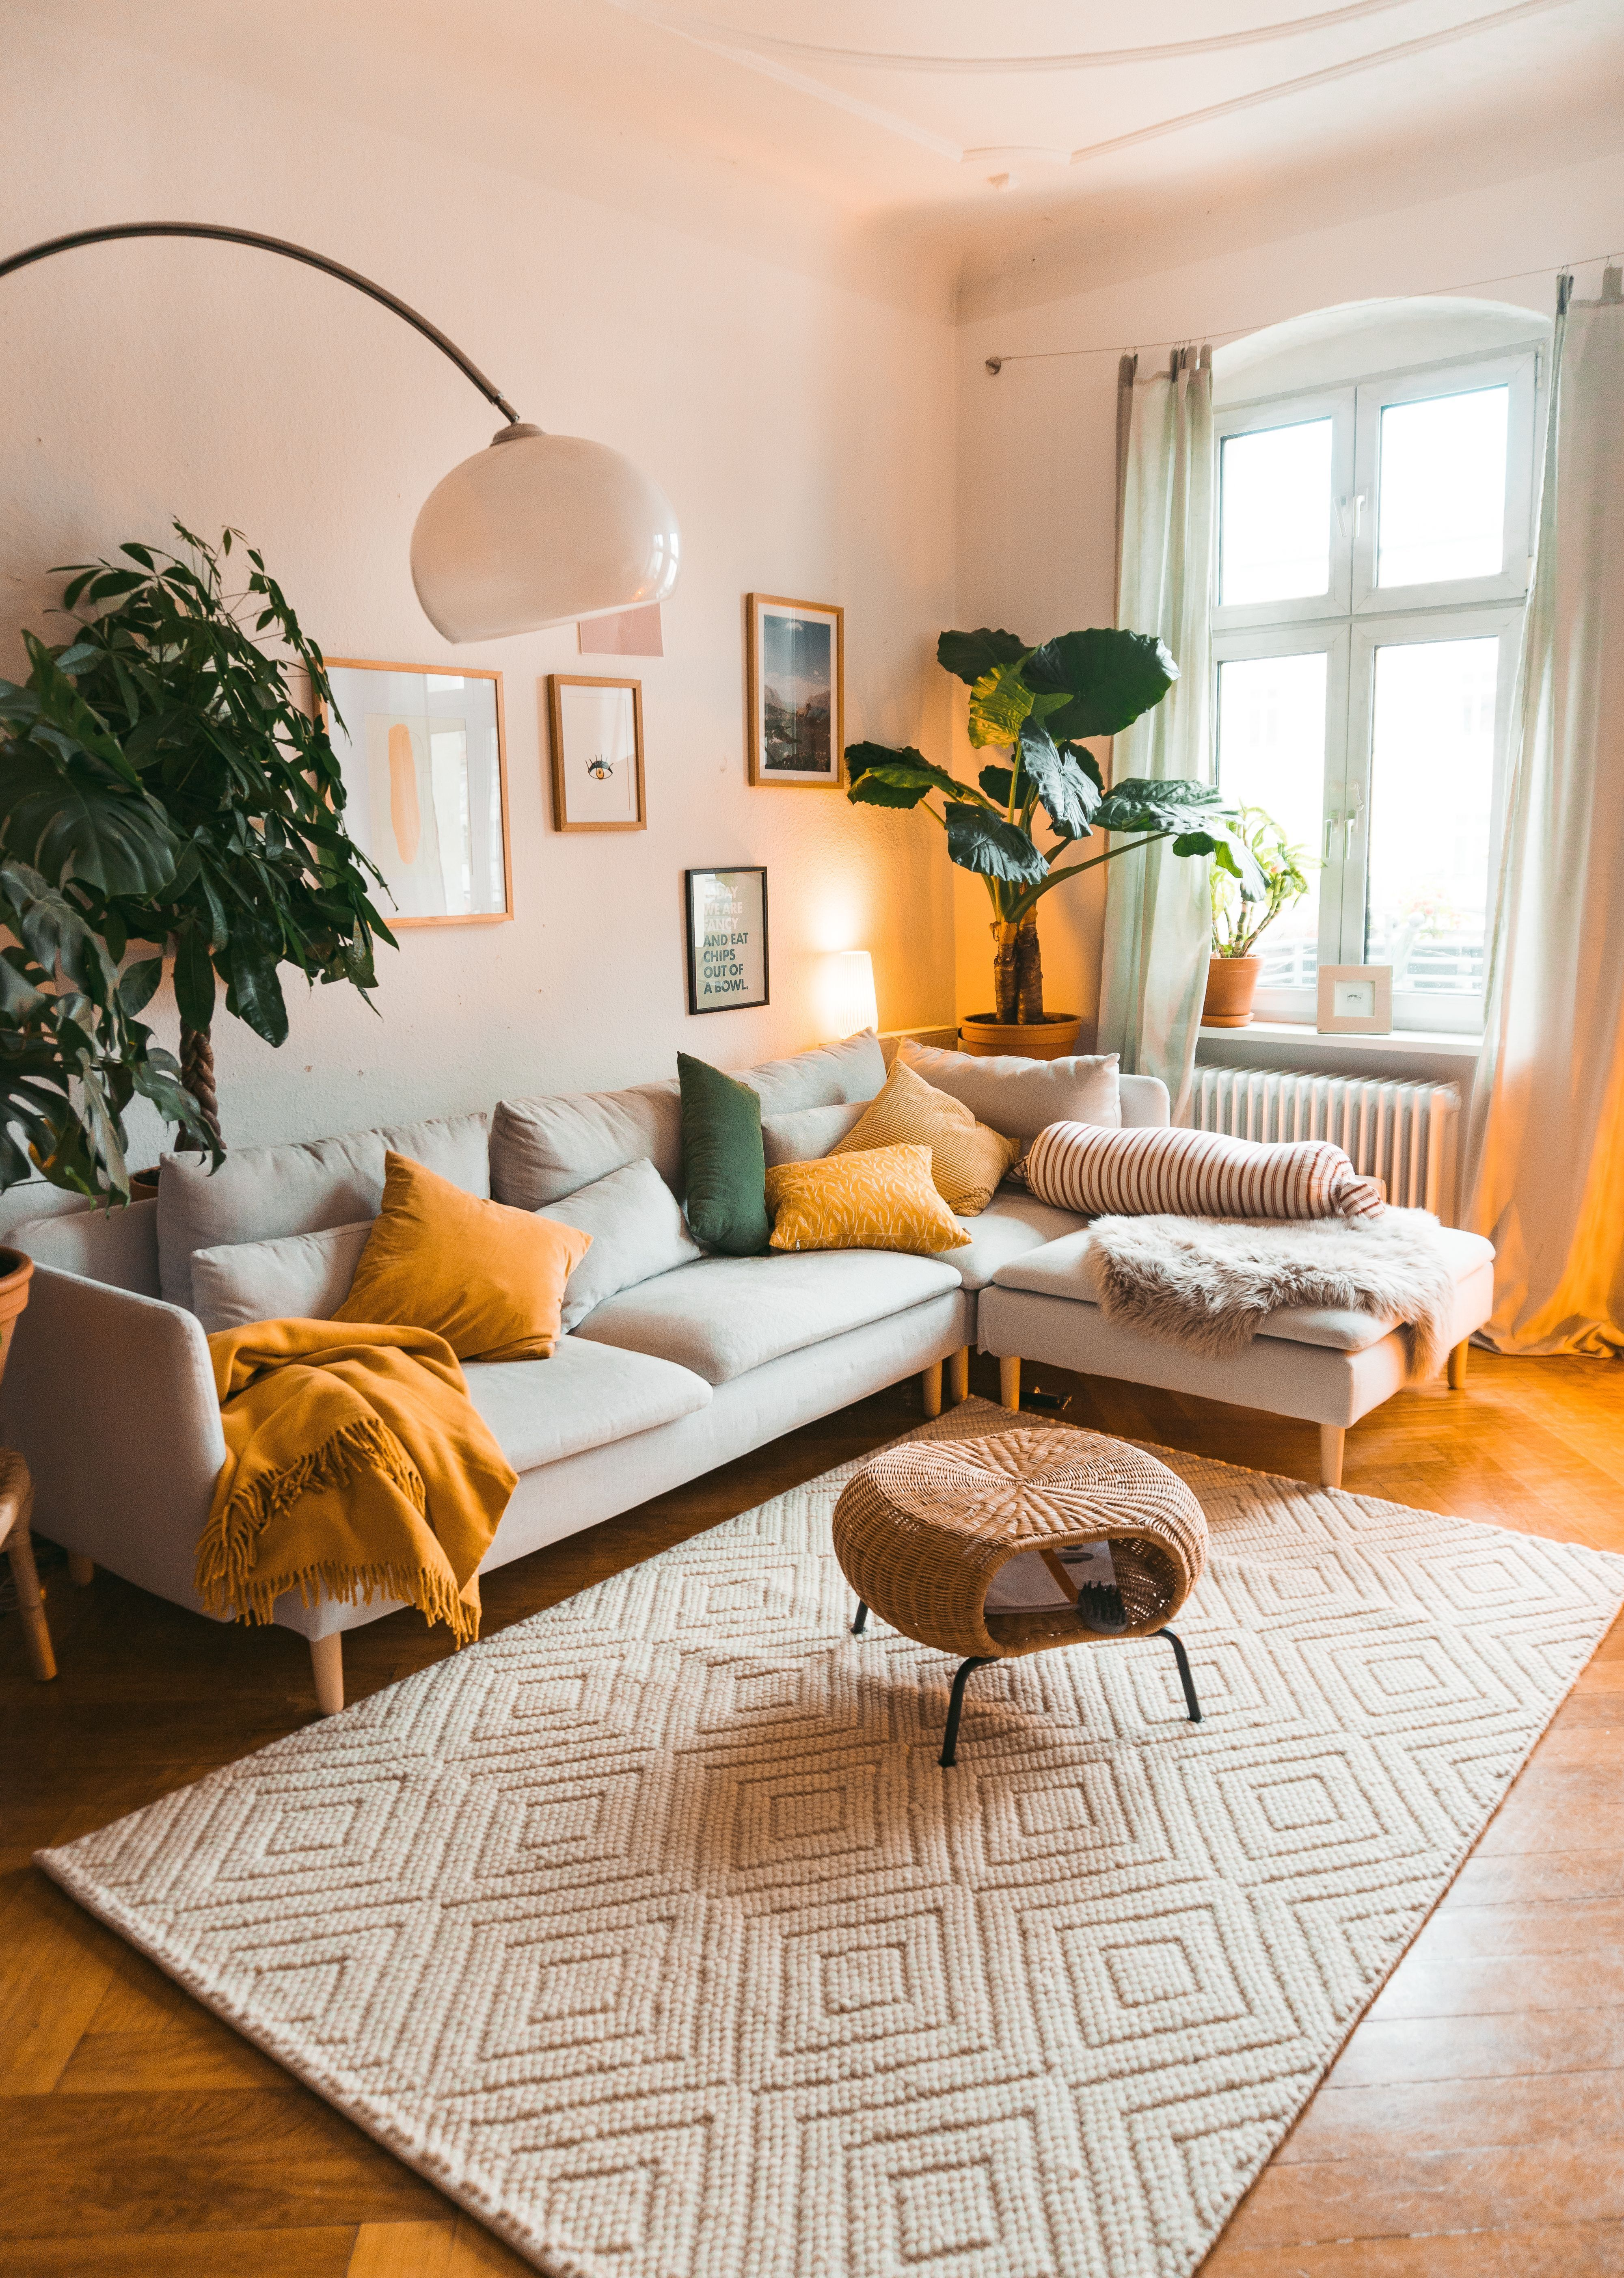 The Best Living Room Warm Color Scheme Warm Living Room Colors Living Room Warm Living Room Decor Warm living room decor